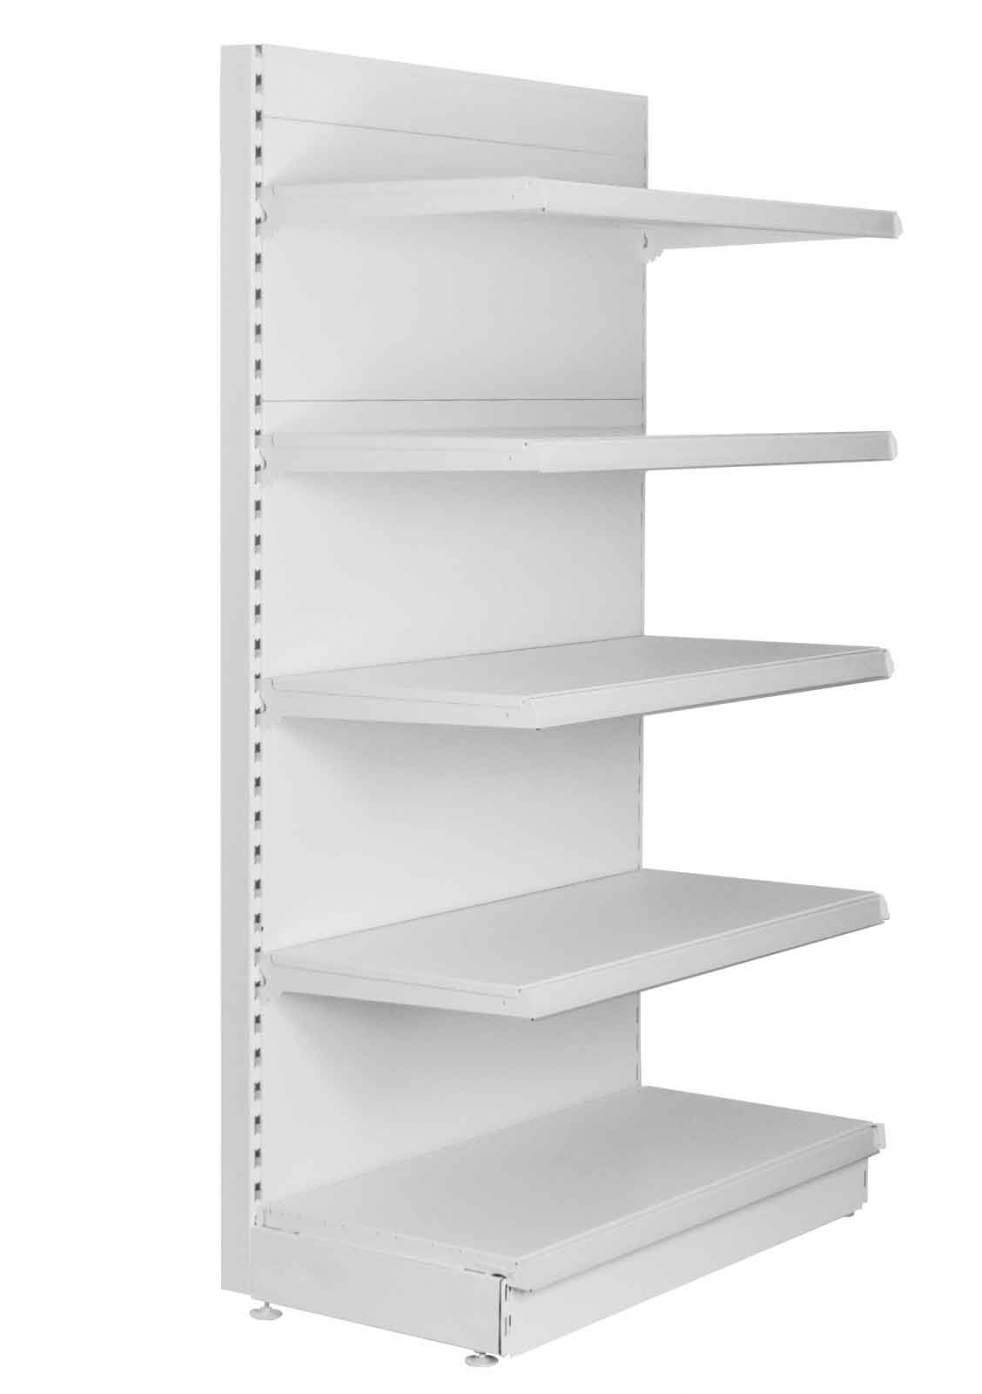 shallow maximum display wall shelving. Black Bedroom Furniture Sets. Home Design Ideas